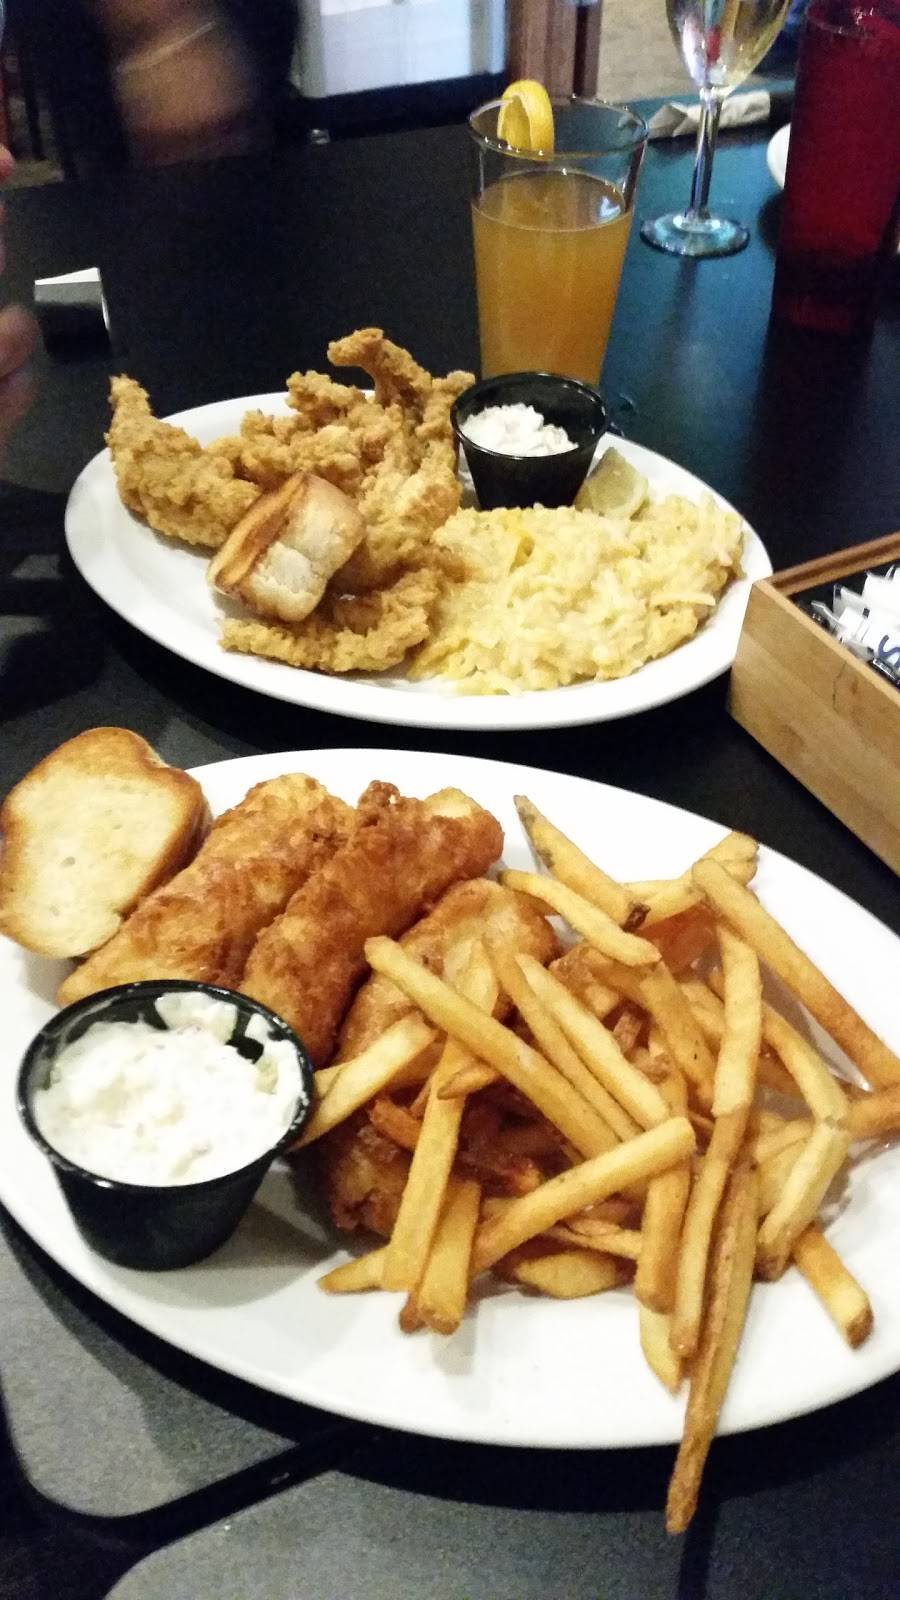 BB Jacks | restaurant | 300 E Holum St, DeForest, WI 53532, USA | 6088469000 OR +1 608-846-9000